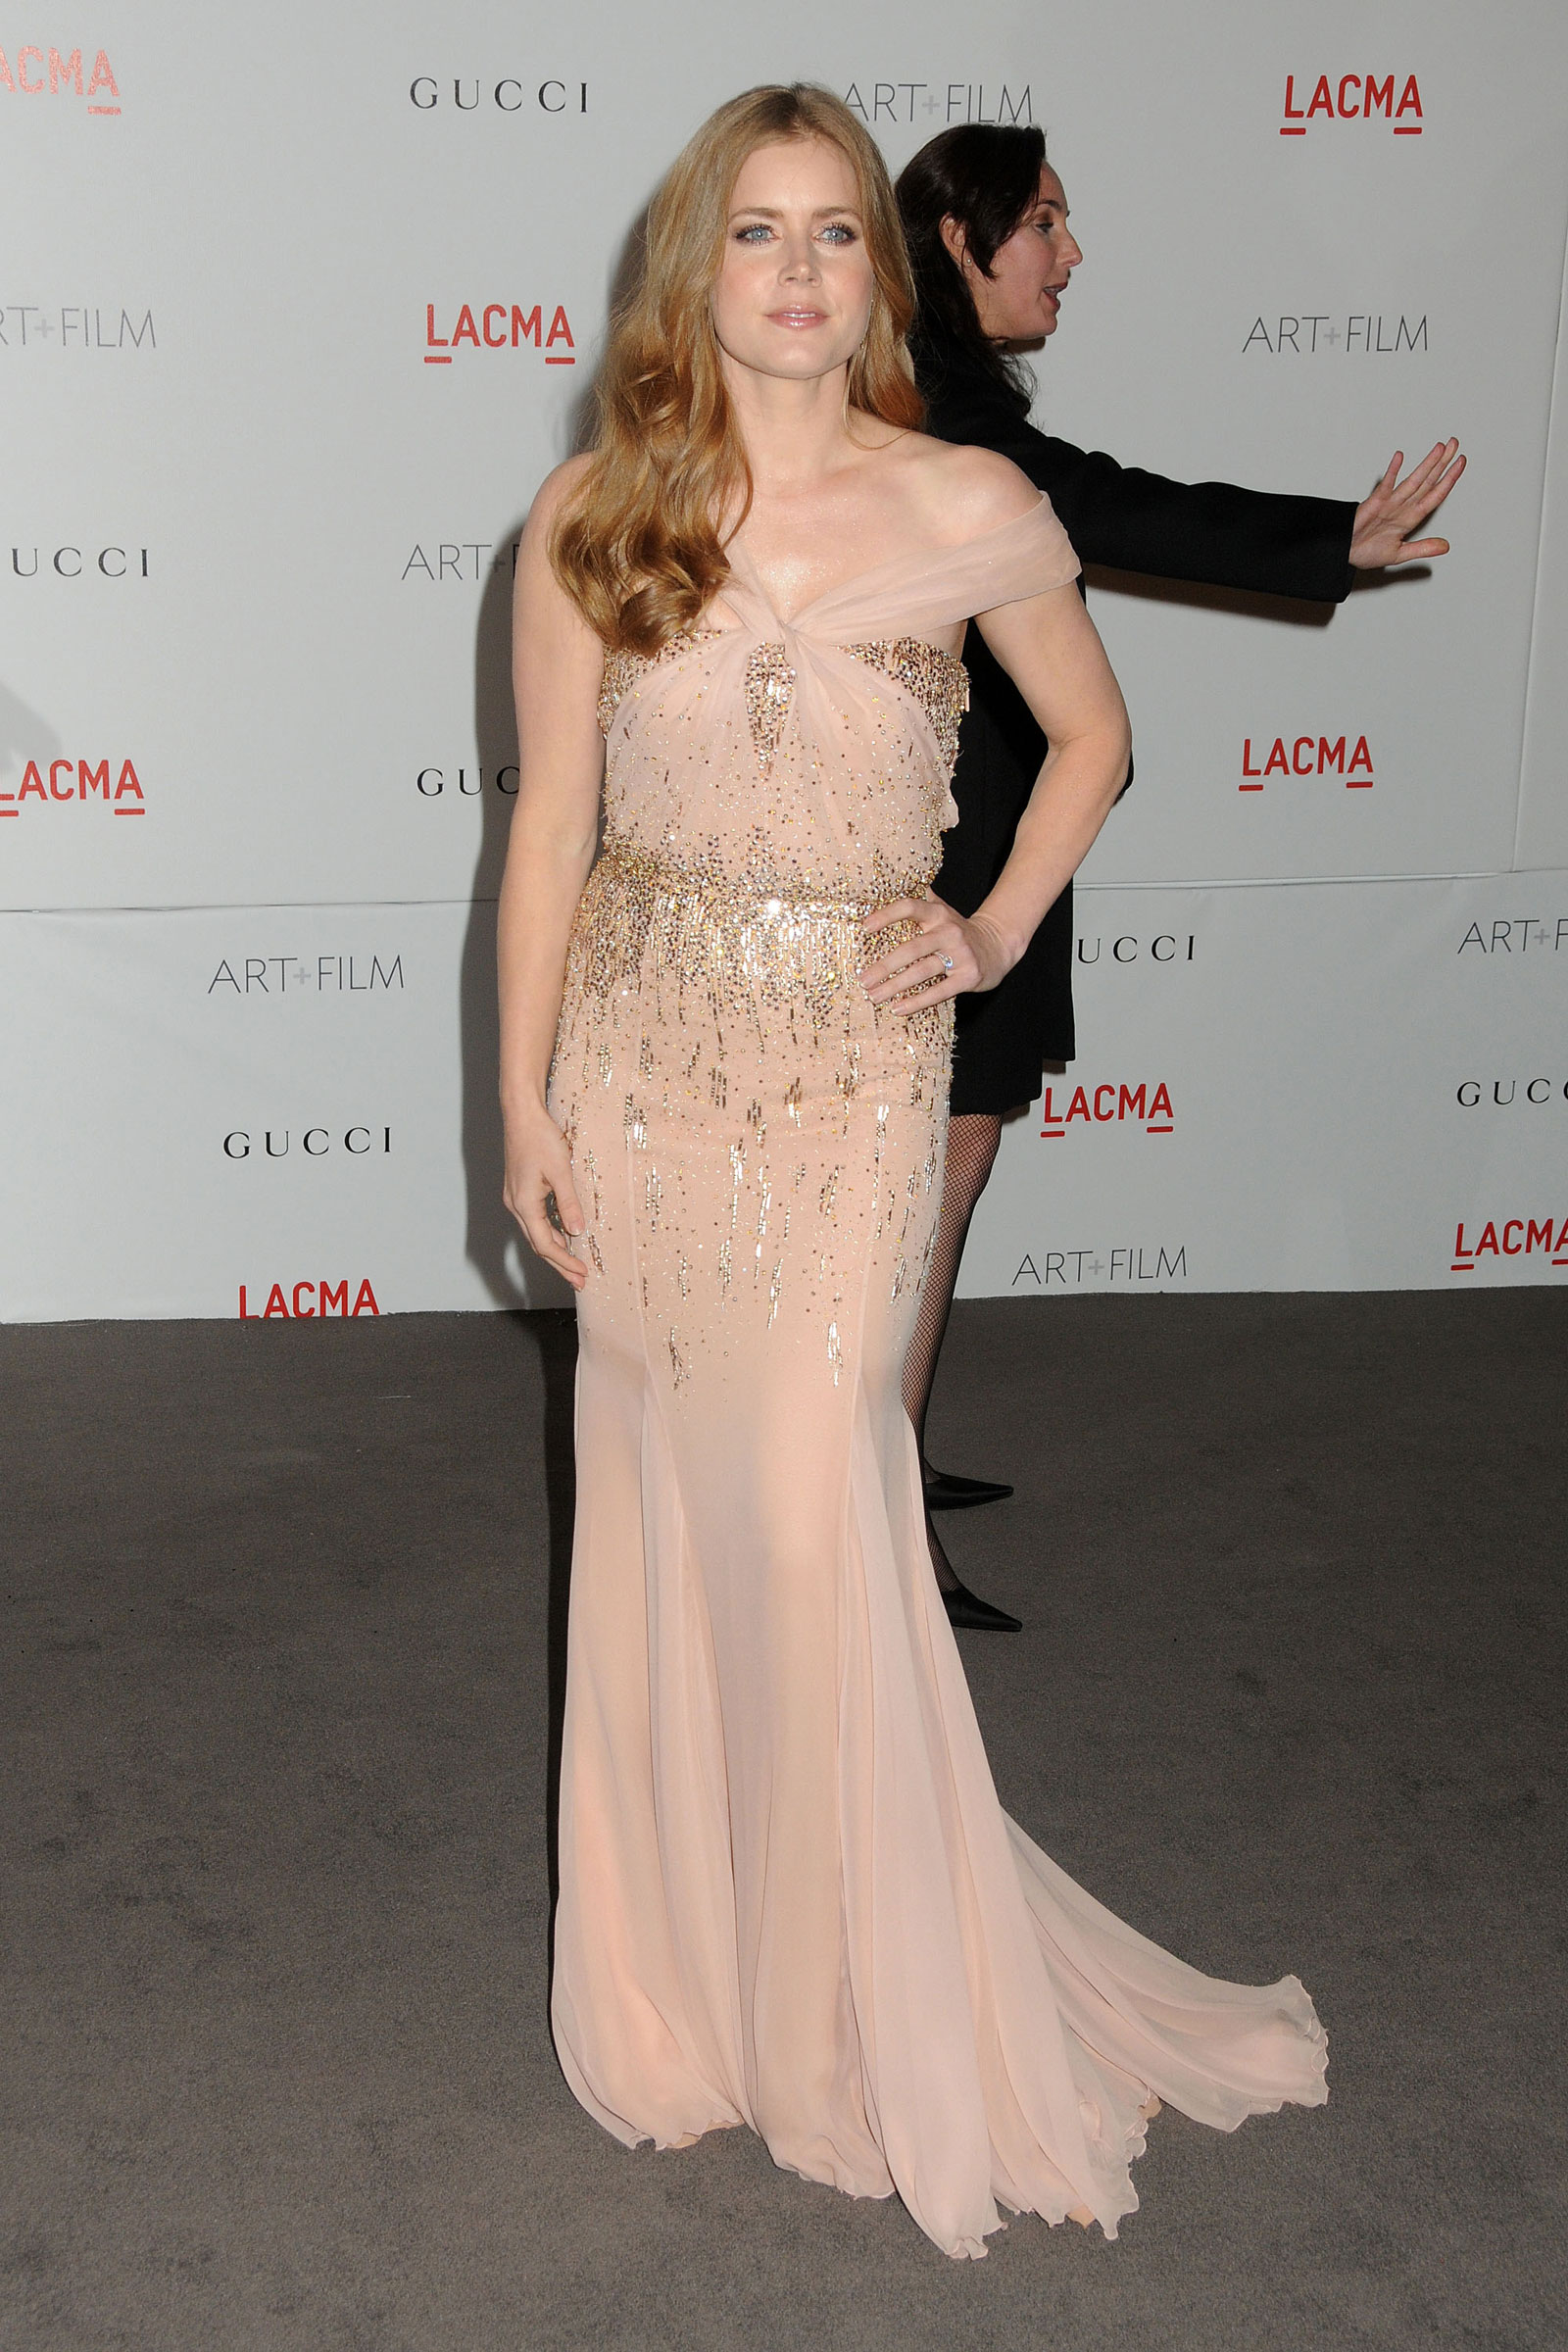 Amy Adams at LACMA Inaugural Art and Film Gala in Los